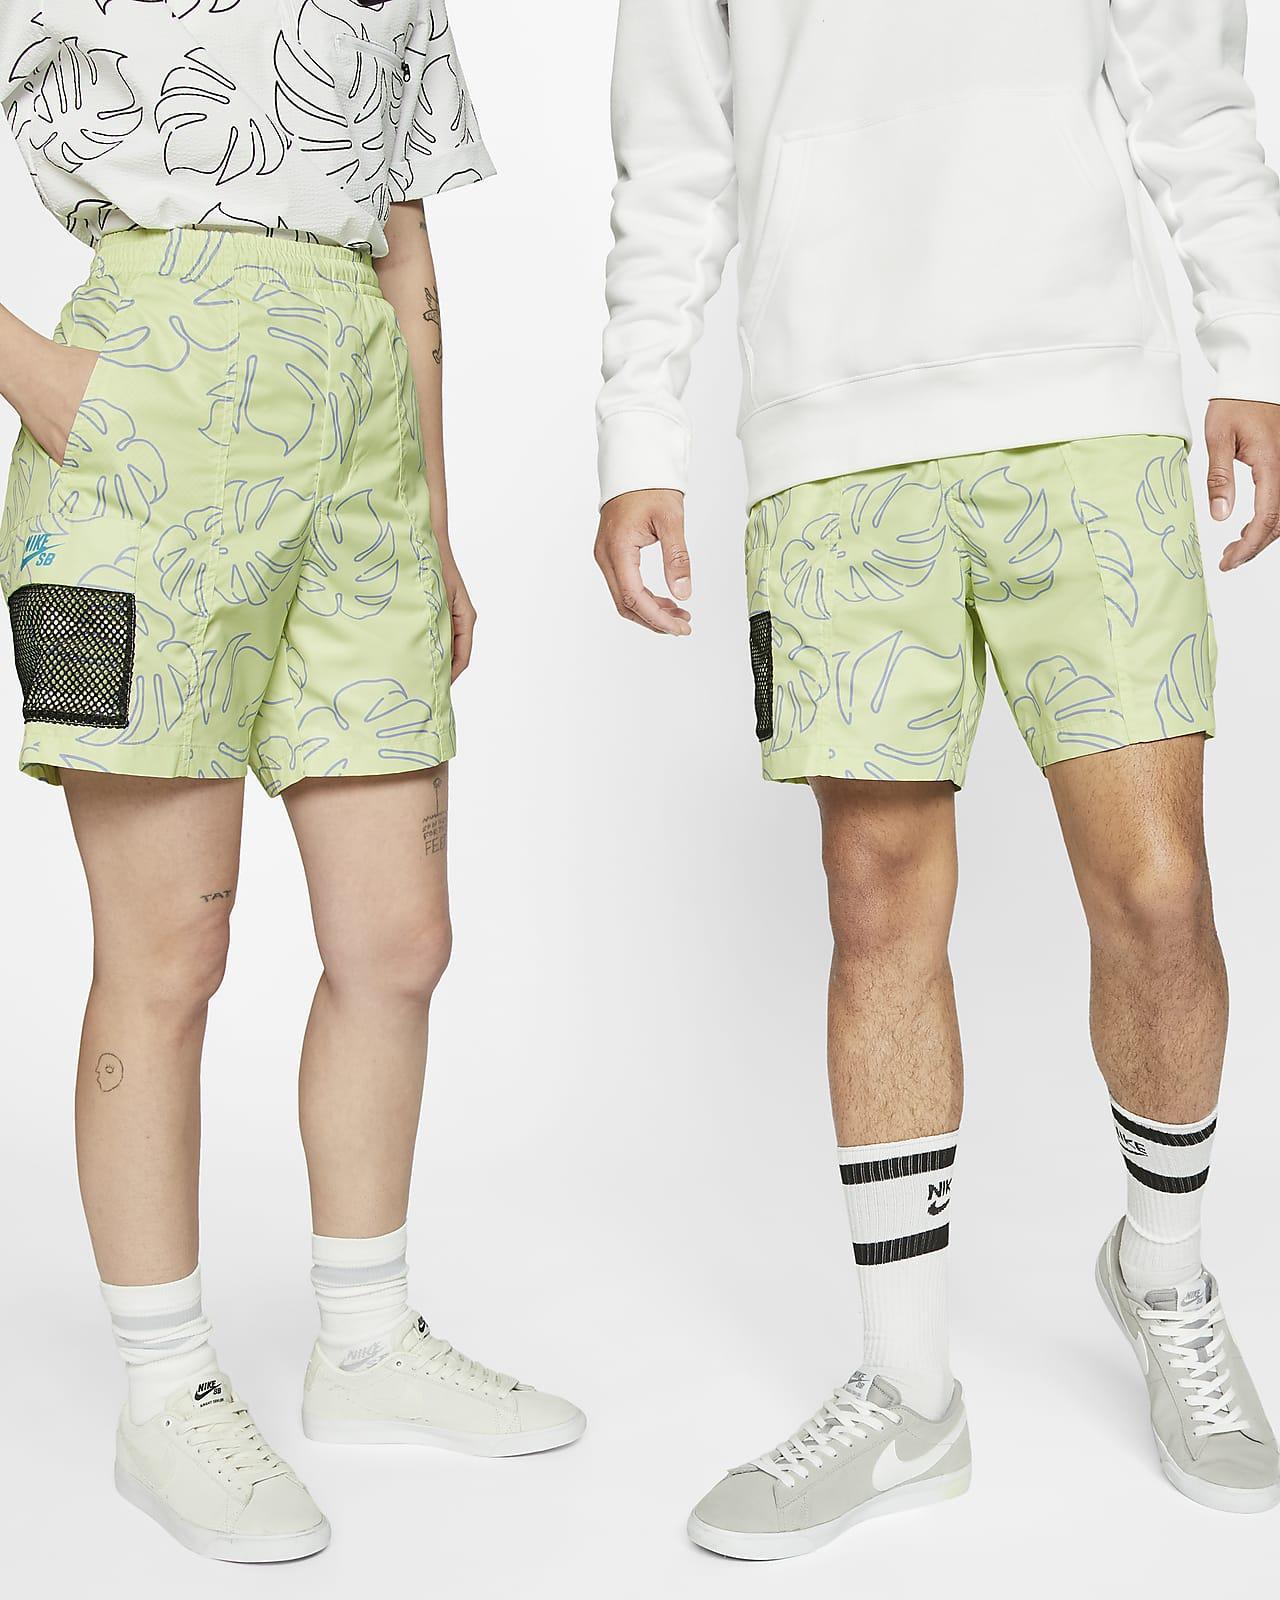 Nike SB Pantalons curts de skateboard - Home